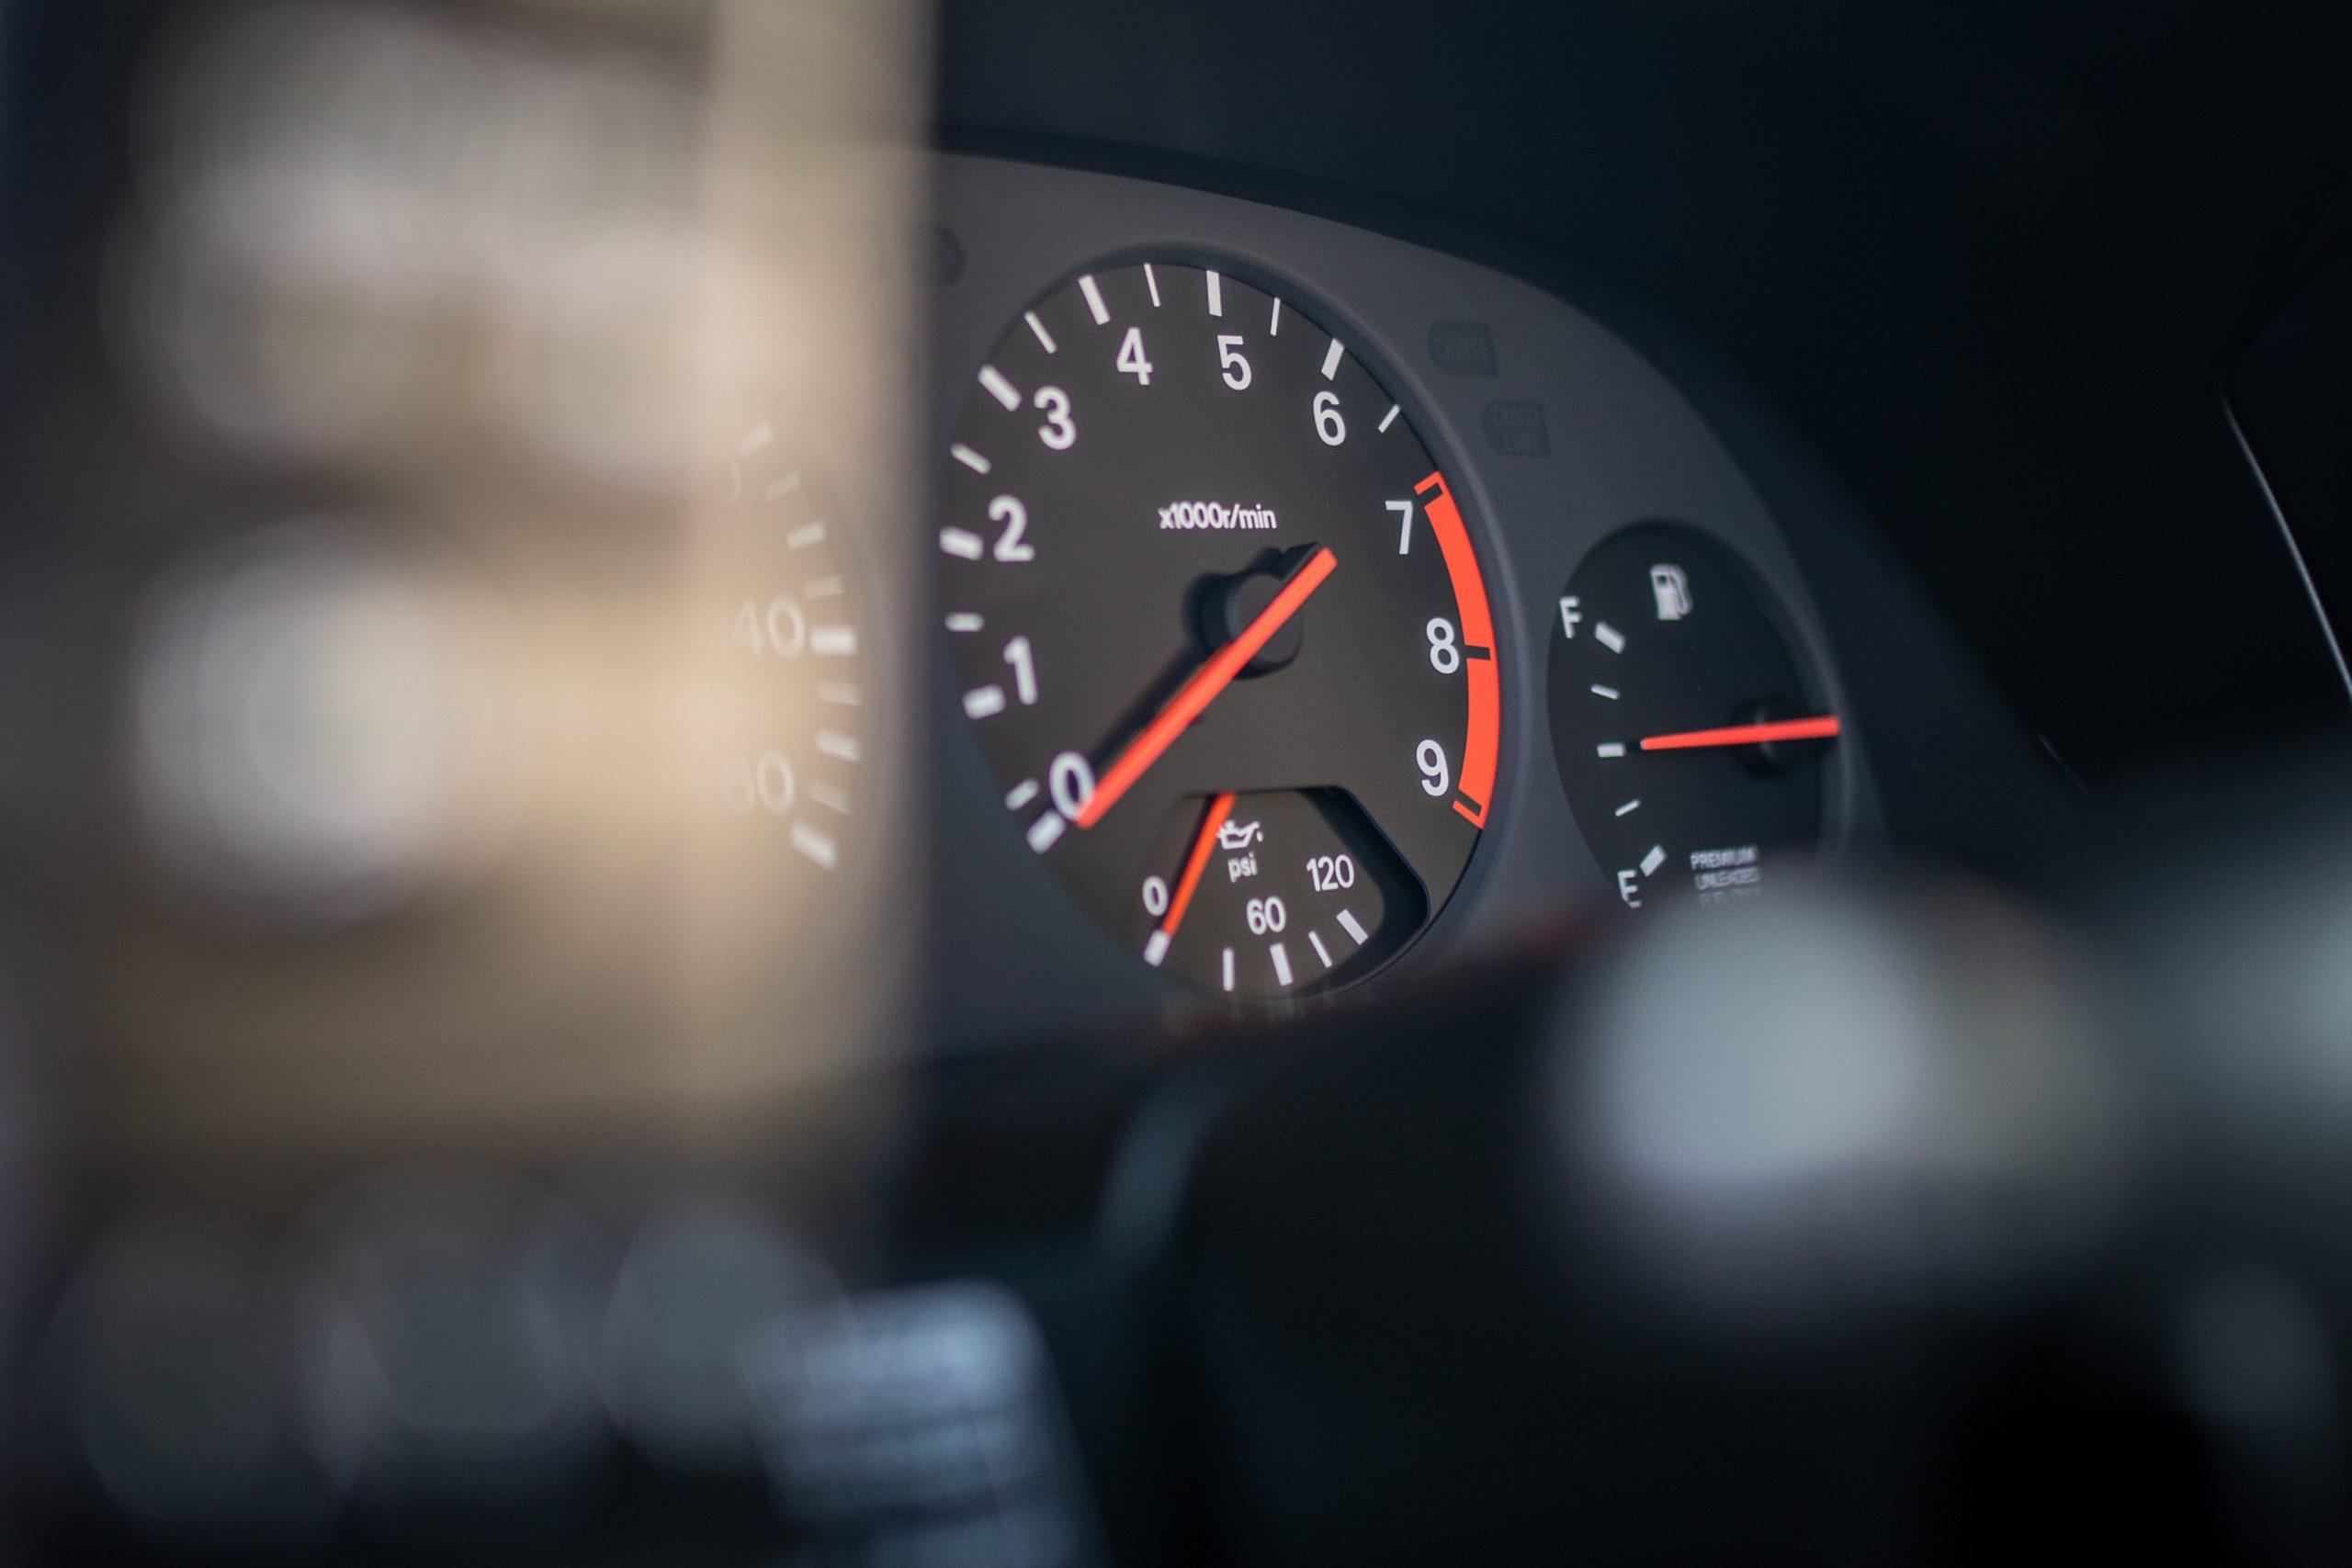 Nissan 300ZX tachometer